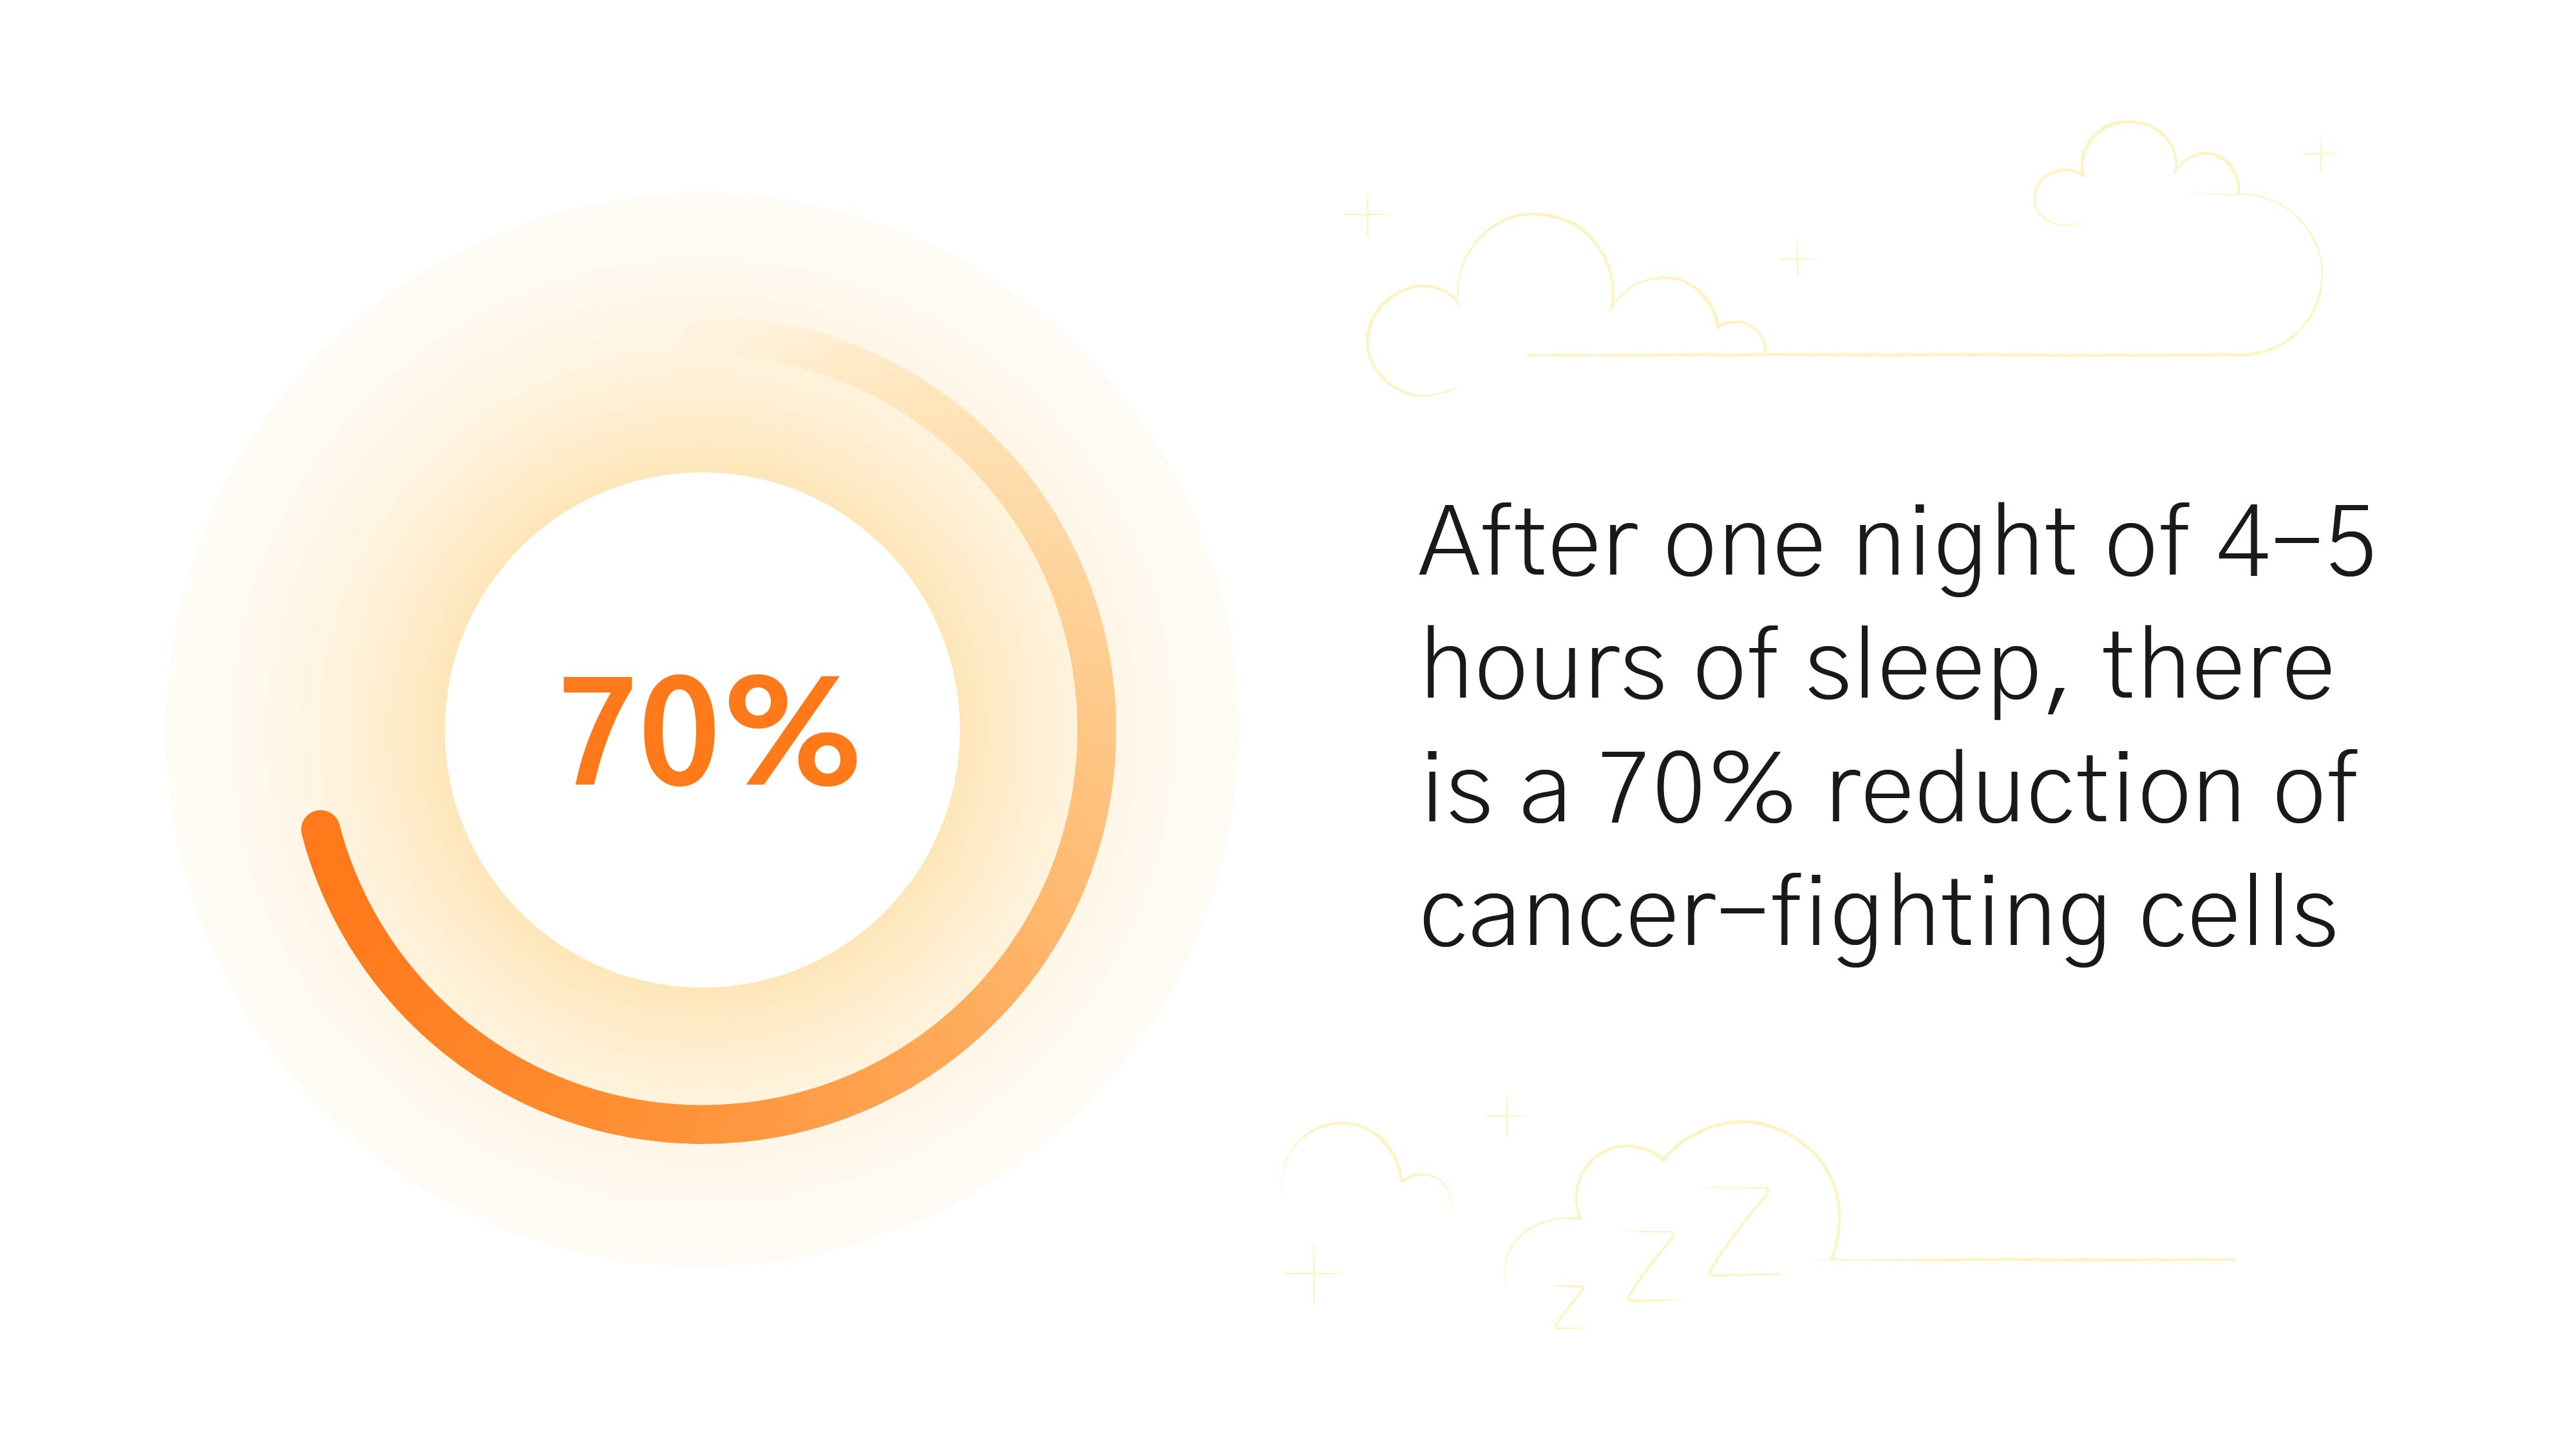 Sleep Boosts Immunity